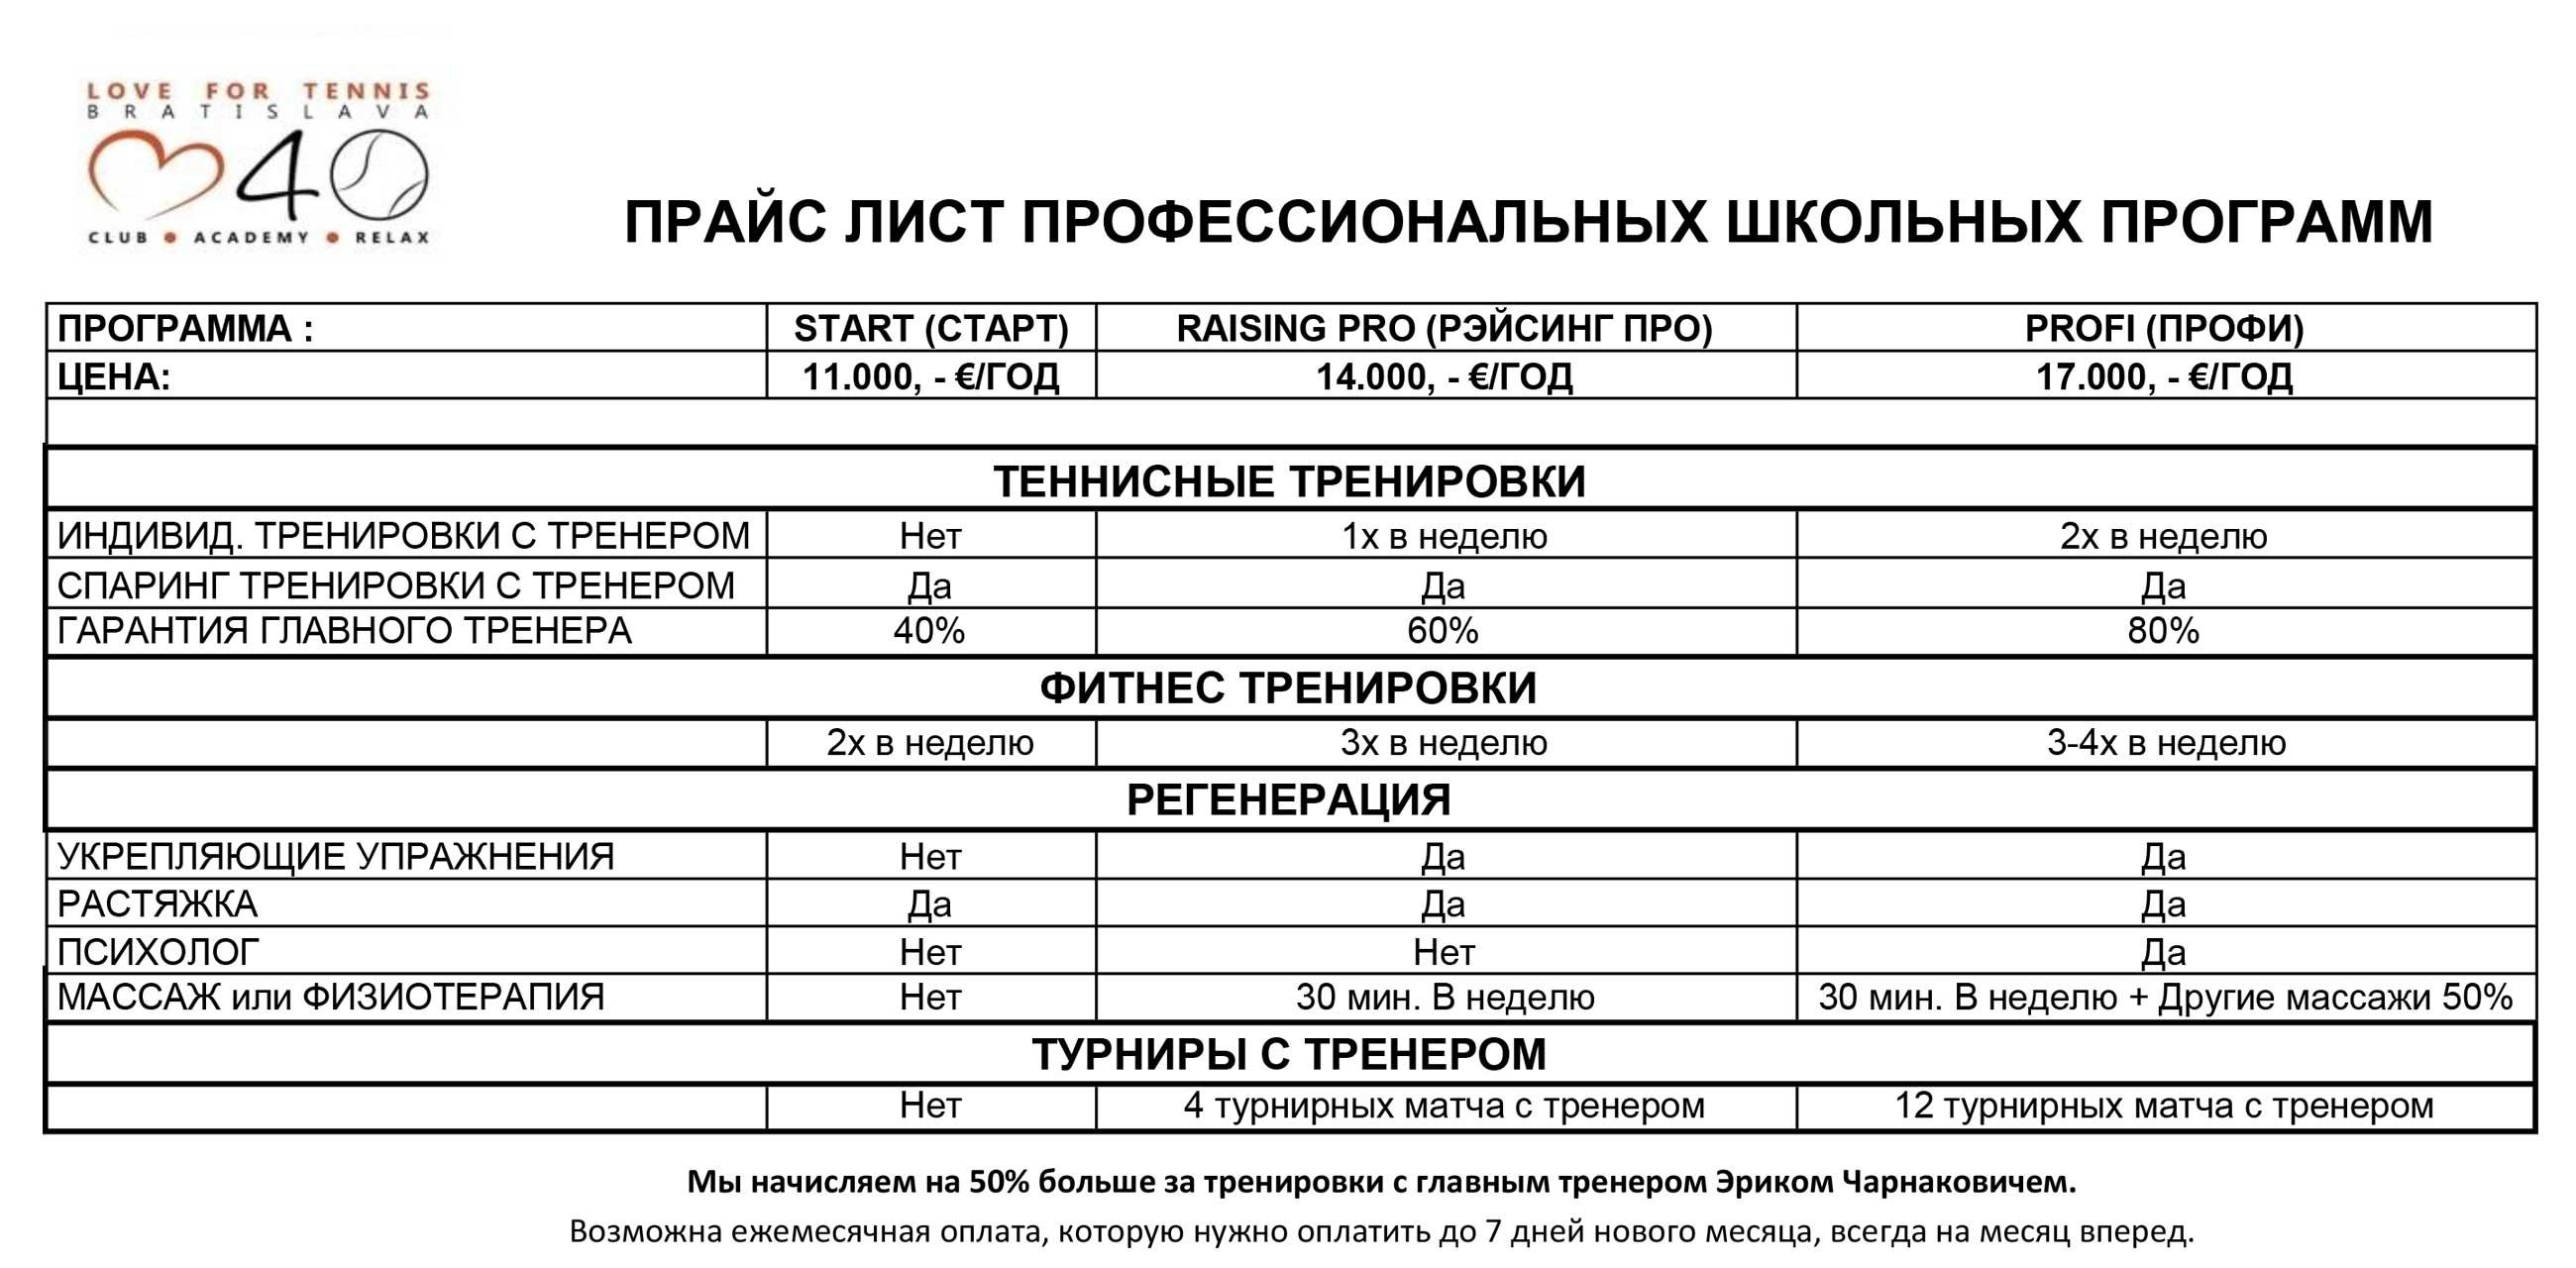 CENNIK_SCHOOL_RUS